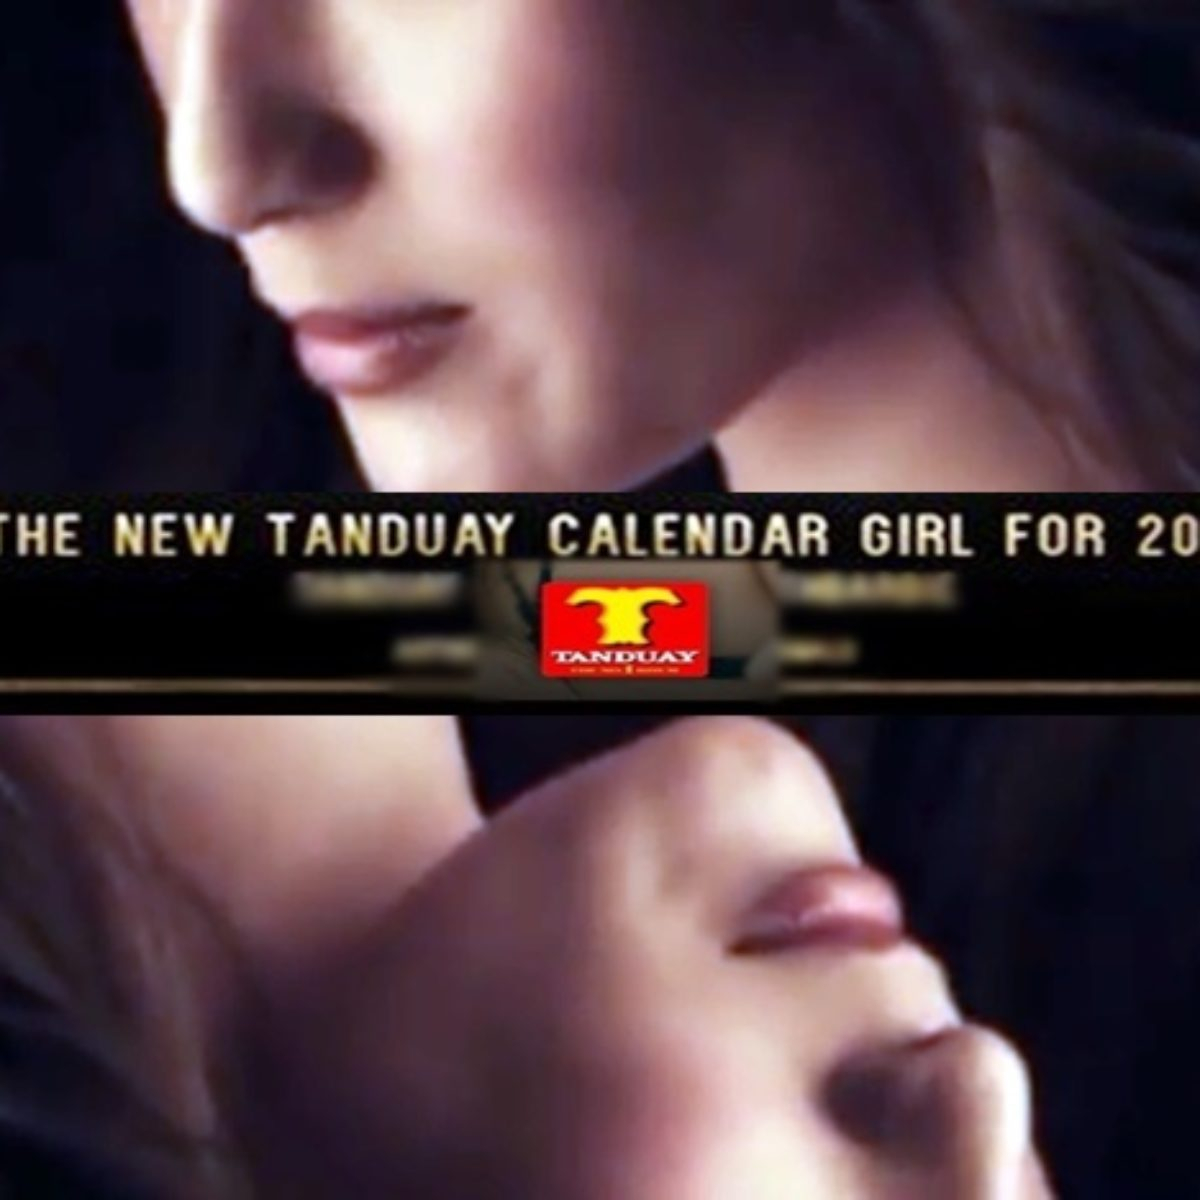 Tanduay Calendar Girl 2020: Meet The New Calendar Girl